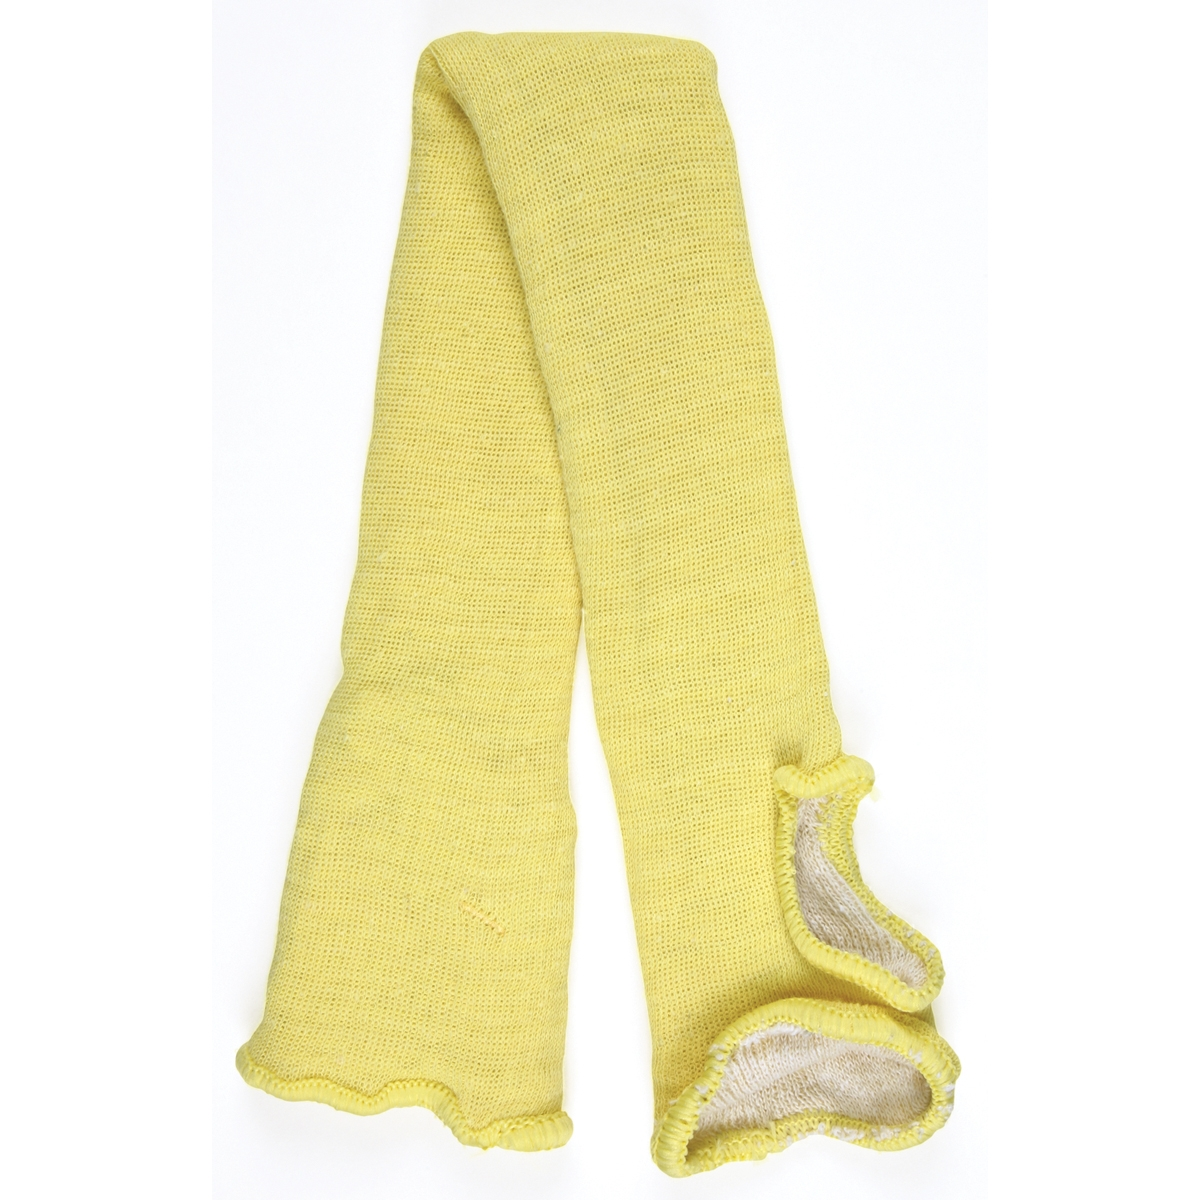 Memphis 9379kcte Economy Sleeve Dupont Kevlar Cotton 22 Length With Thumb Slot